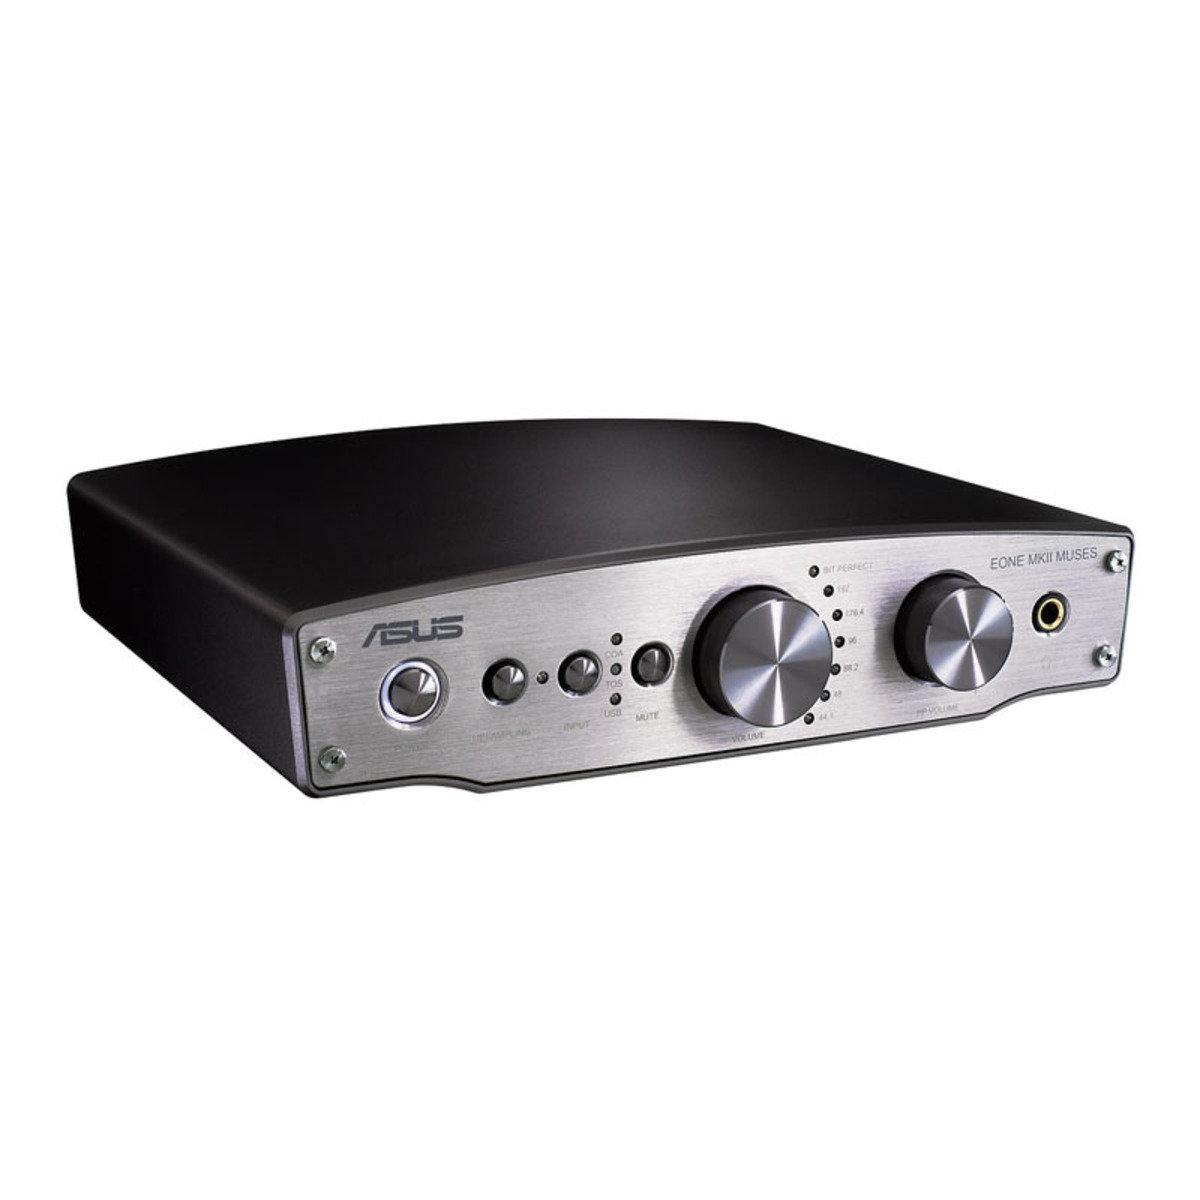 旗艦級USB-DAC高清音效解碼器 Essence One MKII MUSES Edition